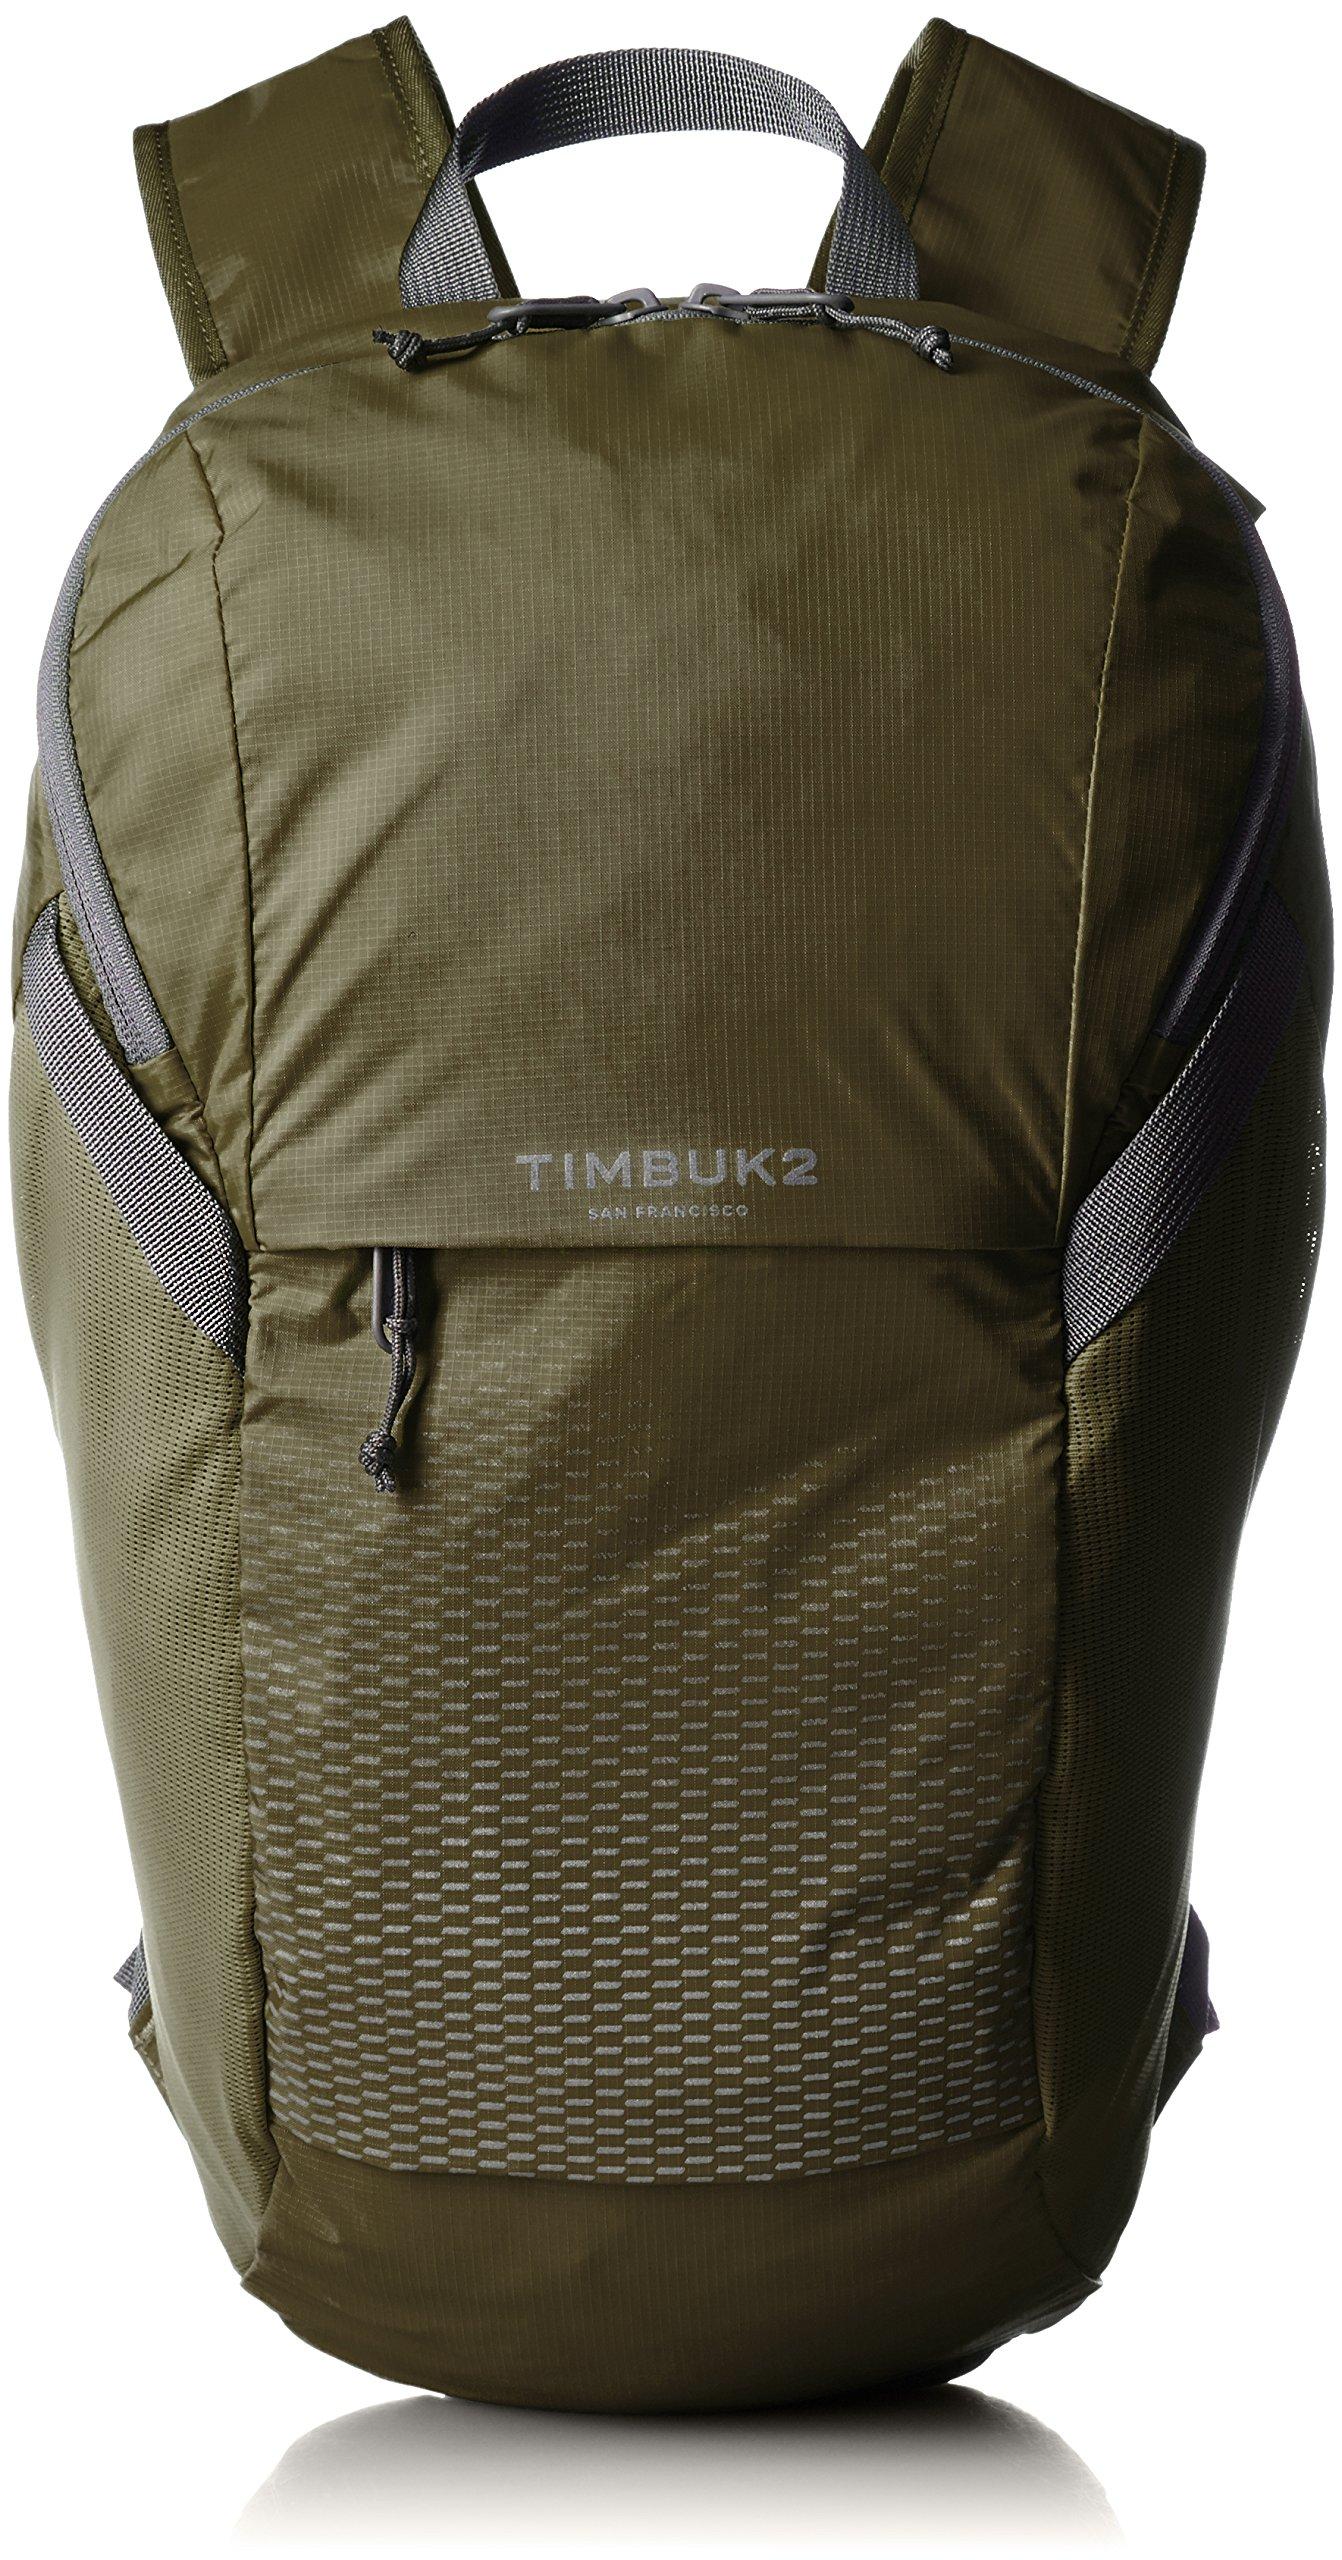 Timbuk2 Rapid Pack, Olivine, One Size by Timbuk2